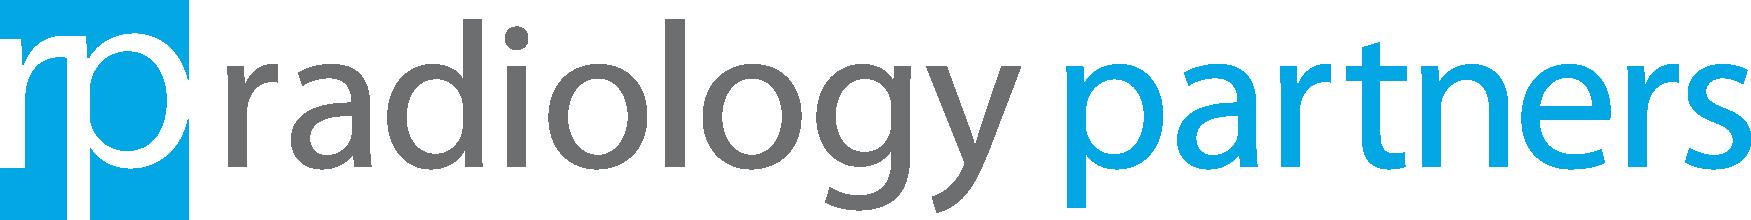 Strategic Alliance Partnership   <b>Radiology Partners</b>